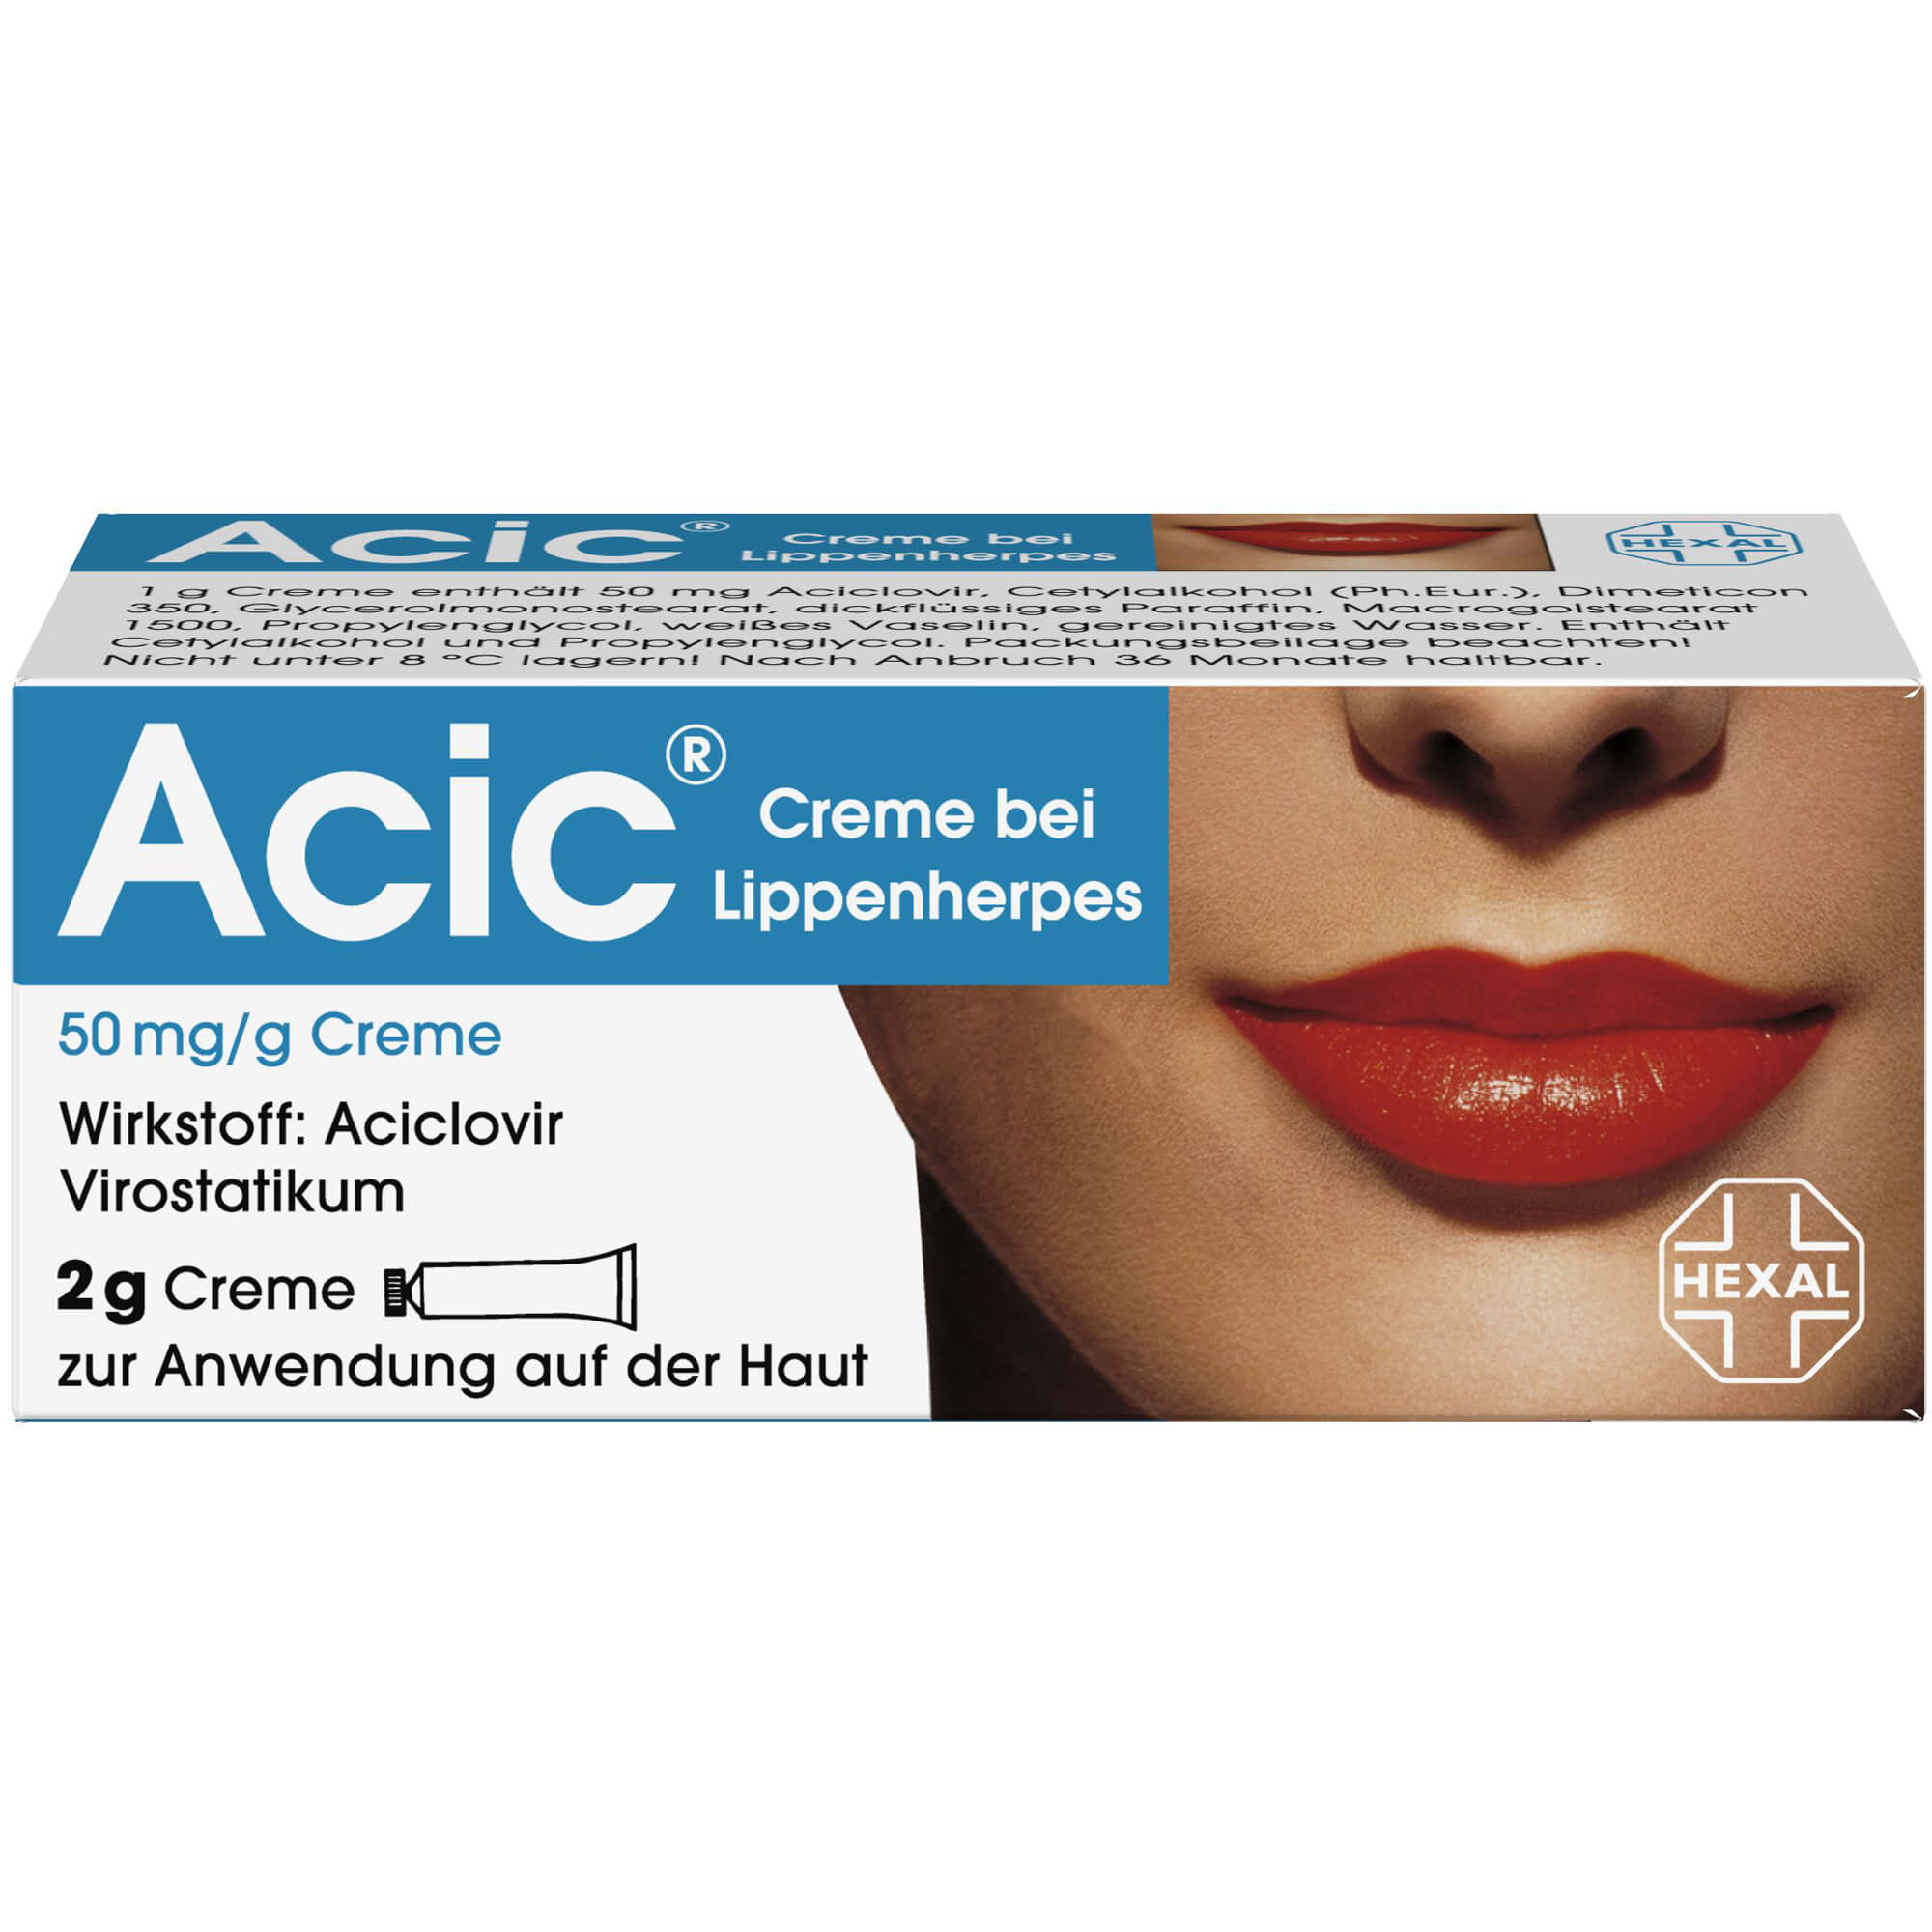 ACIC-Creme-bei-Lippenherpes